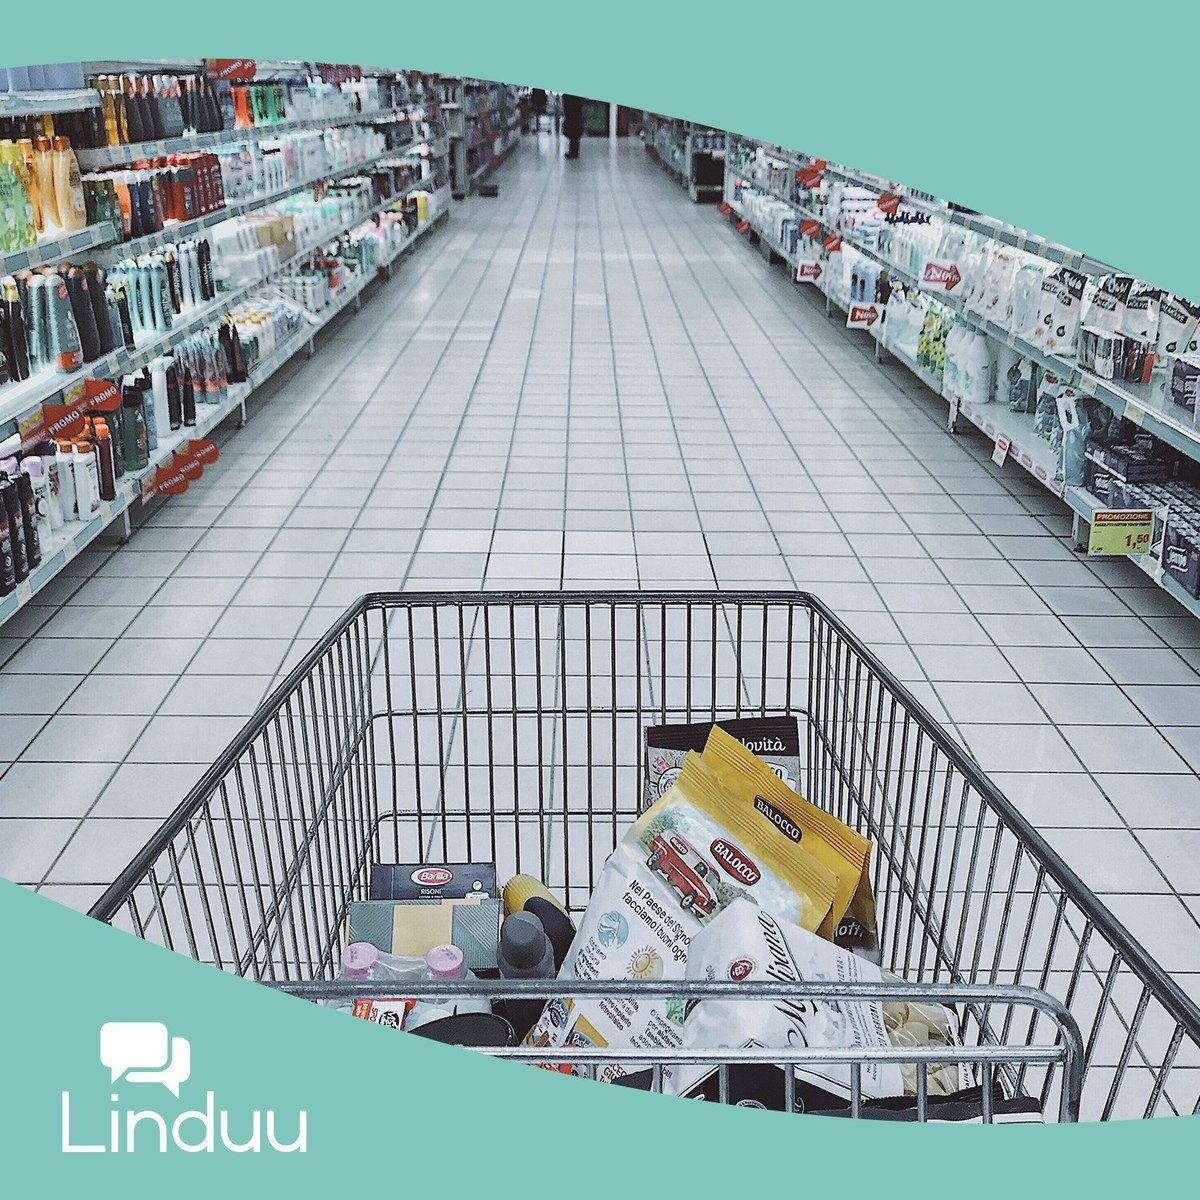 Linduu free coins